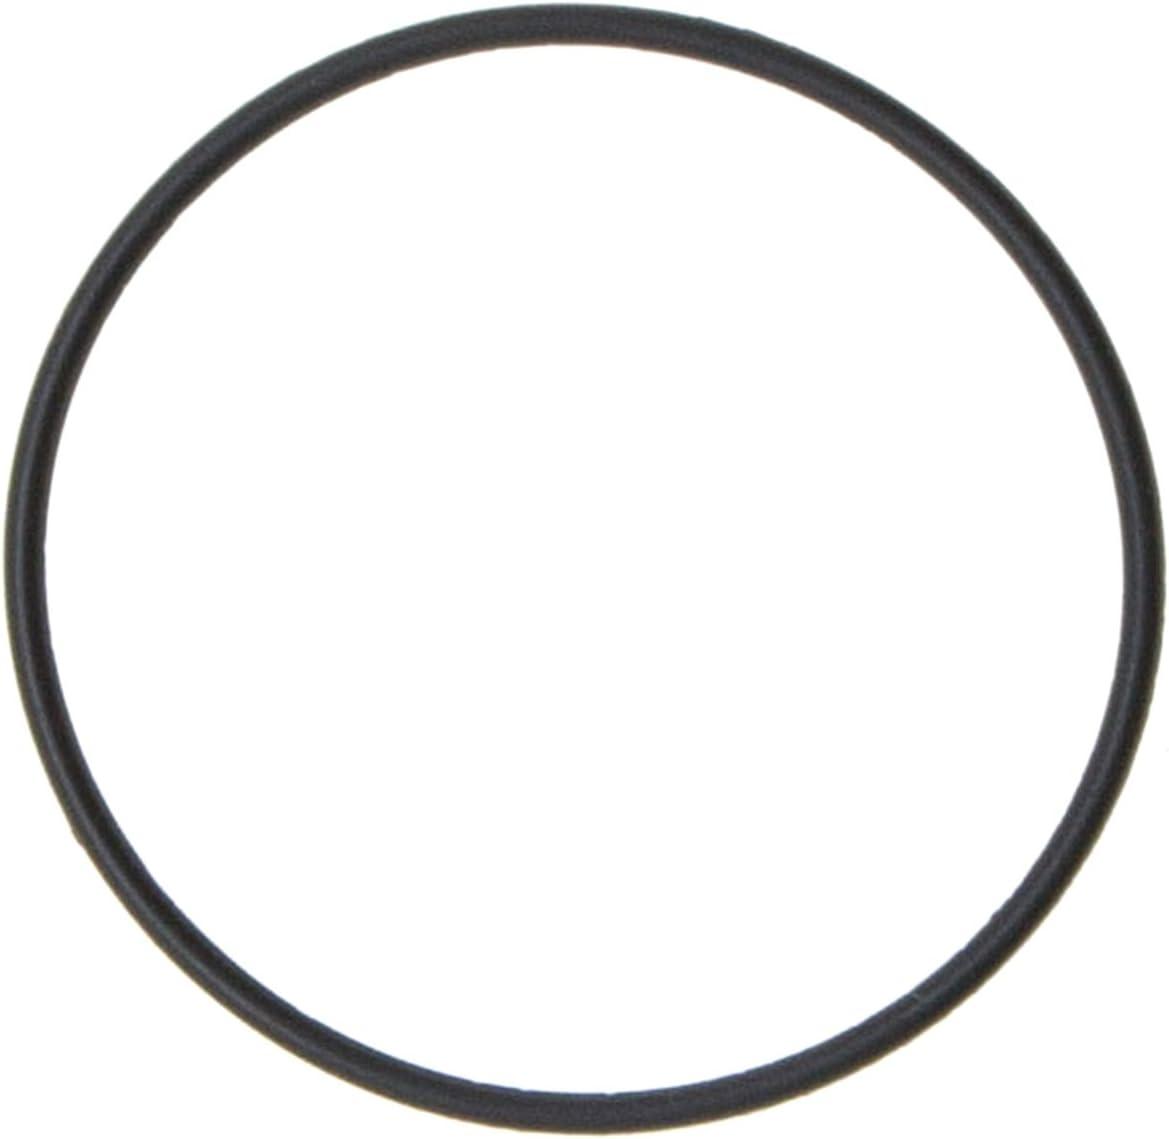 Menge 10 St/ück Dichtringe//O-Ringe 73 x 3 mm NBR 70